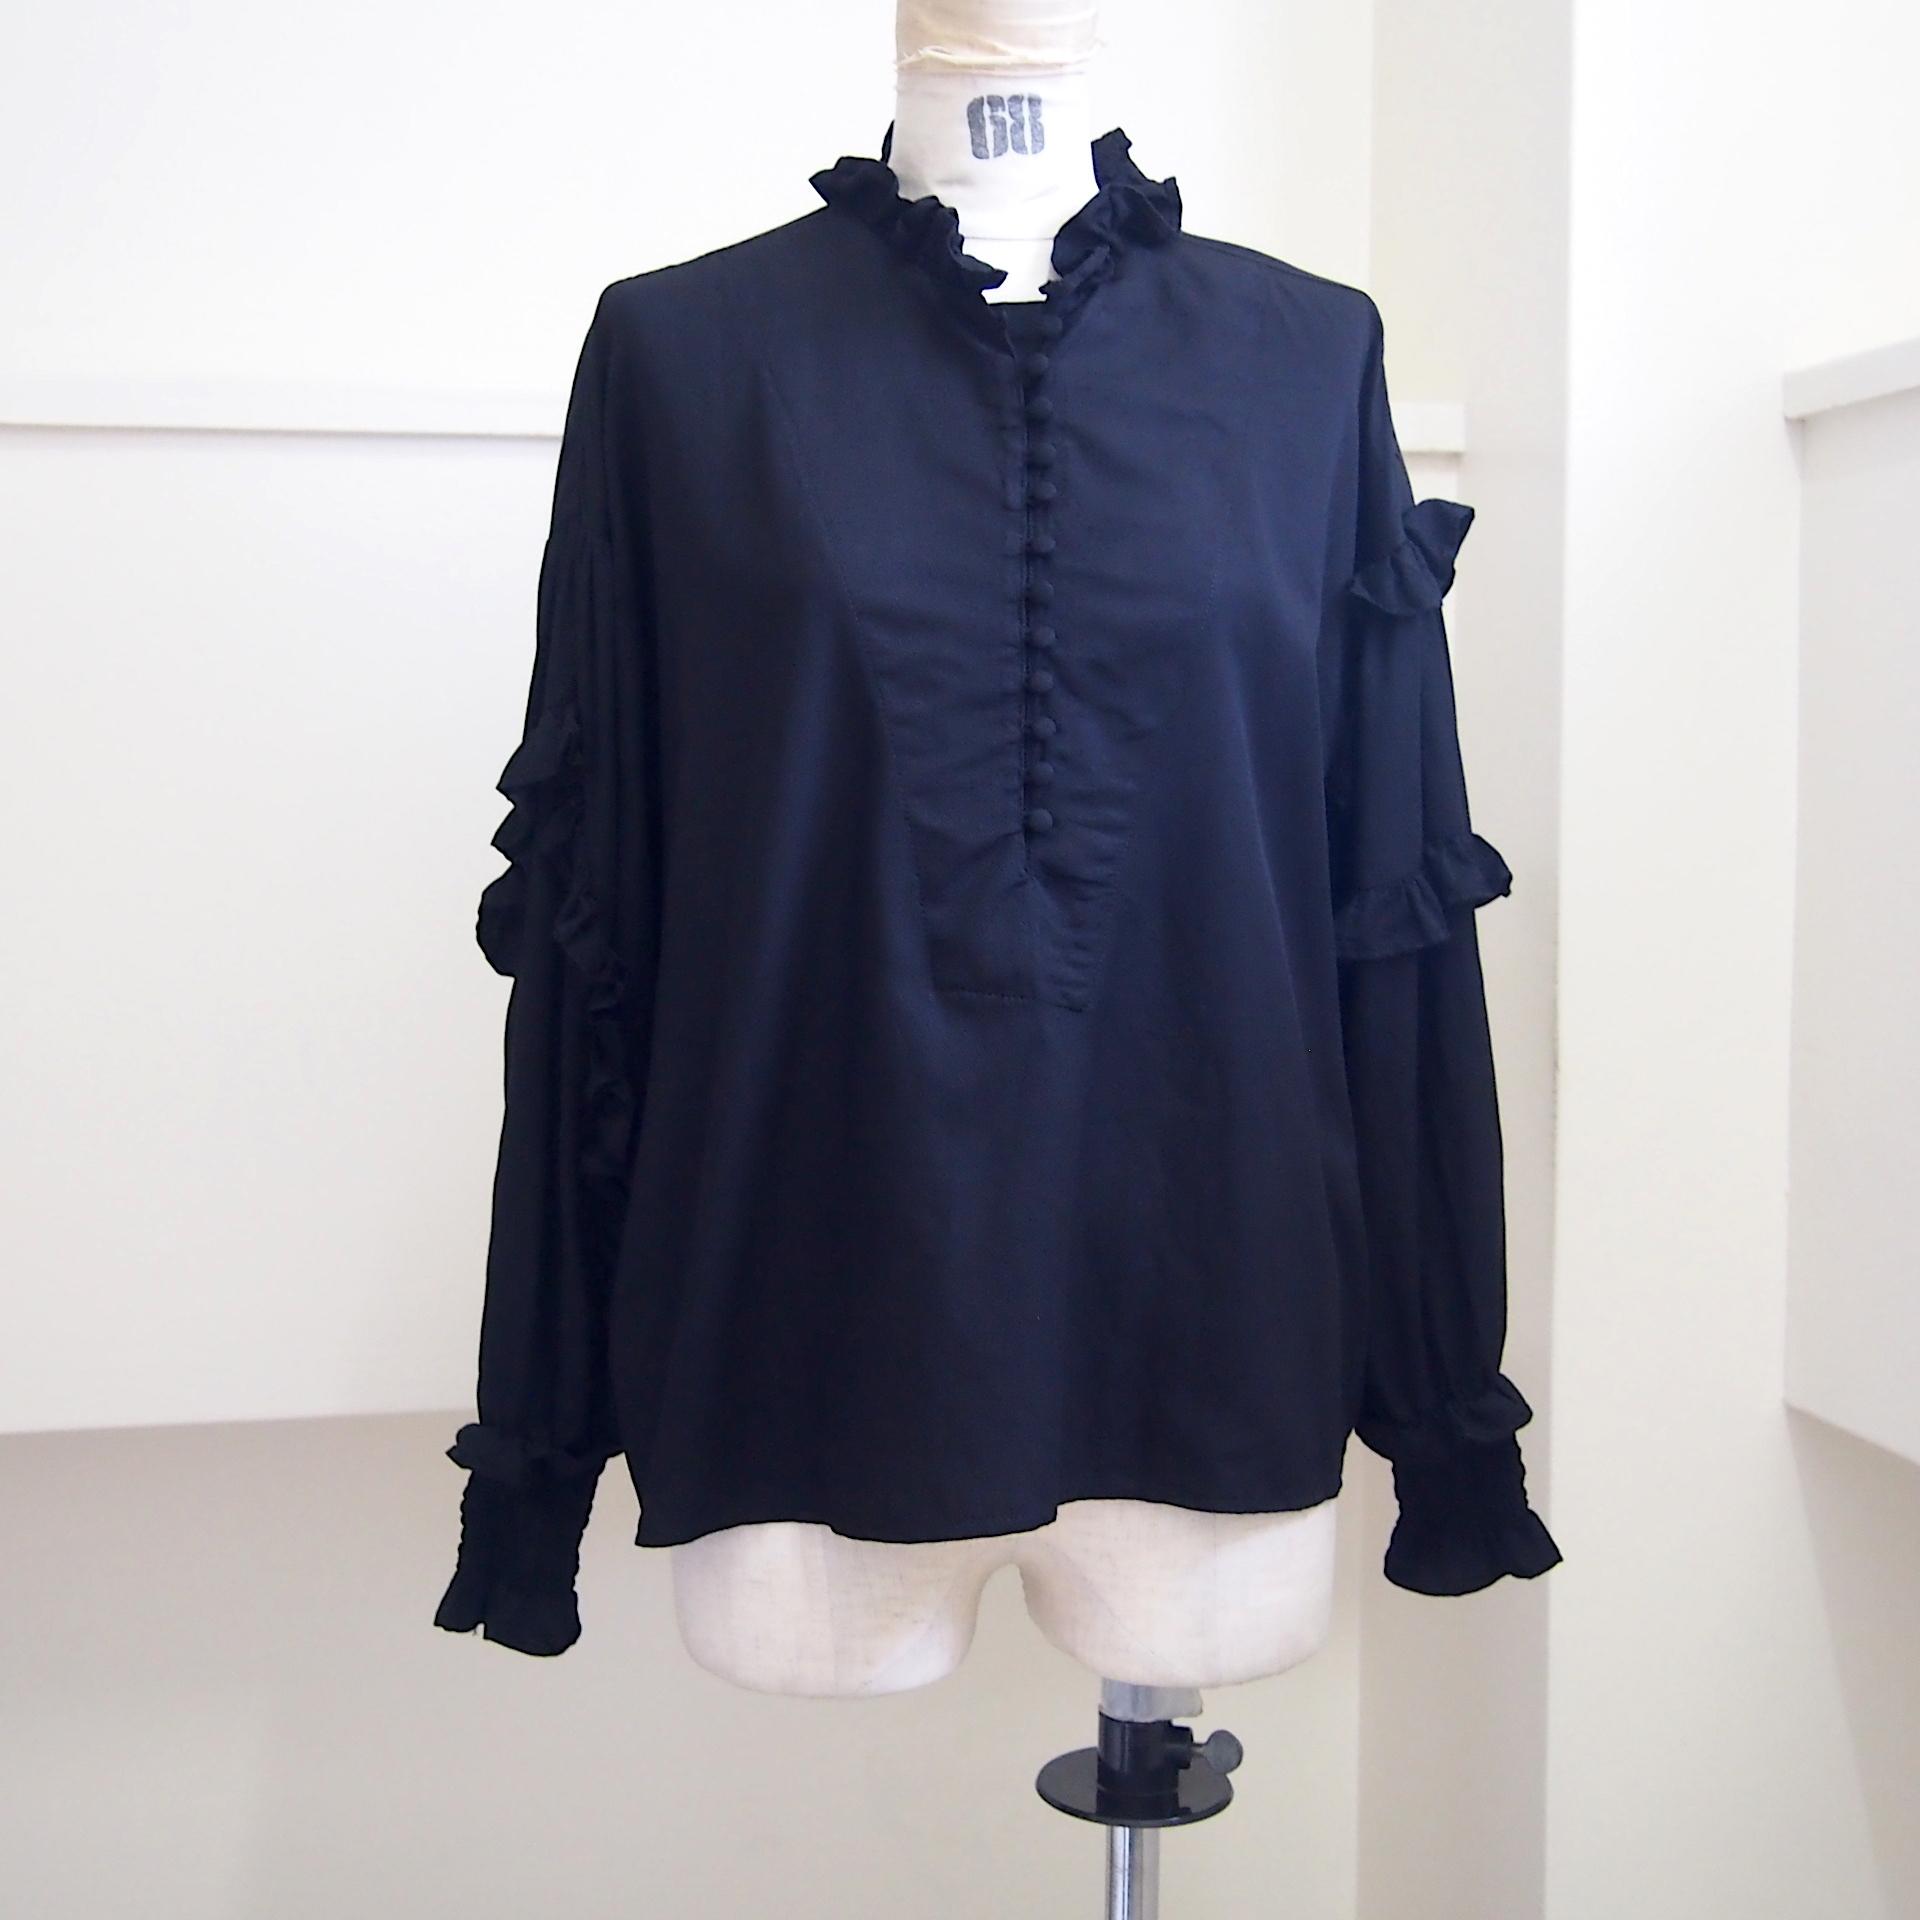 【RehersalL】twill frill blouse(black) /【リハーズオール】ツイルフリルブラウス(ブラック)